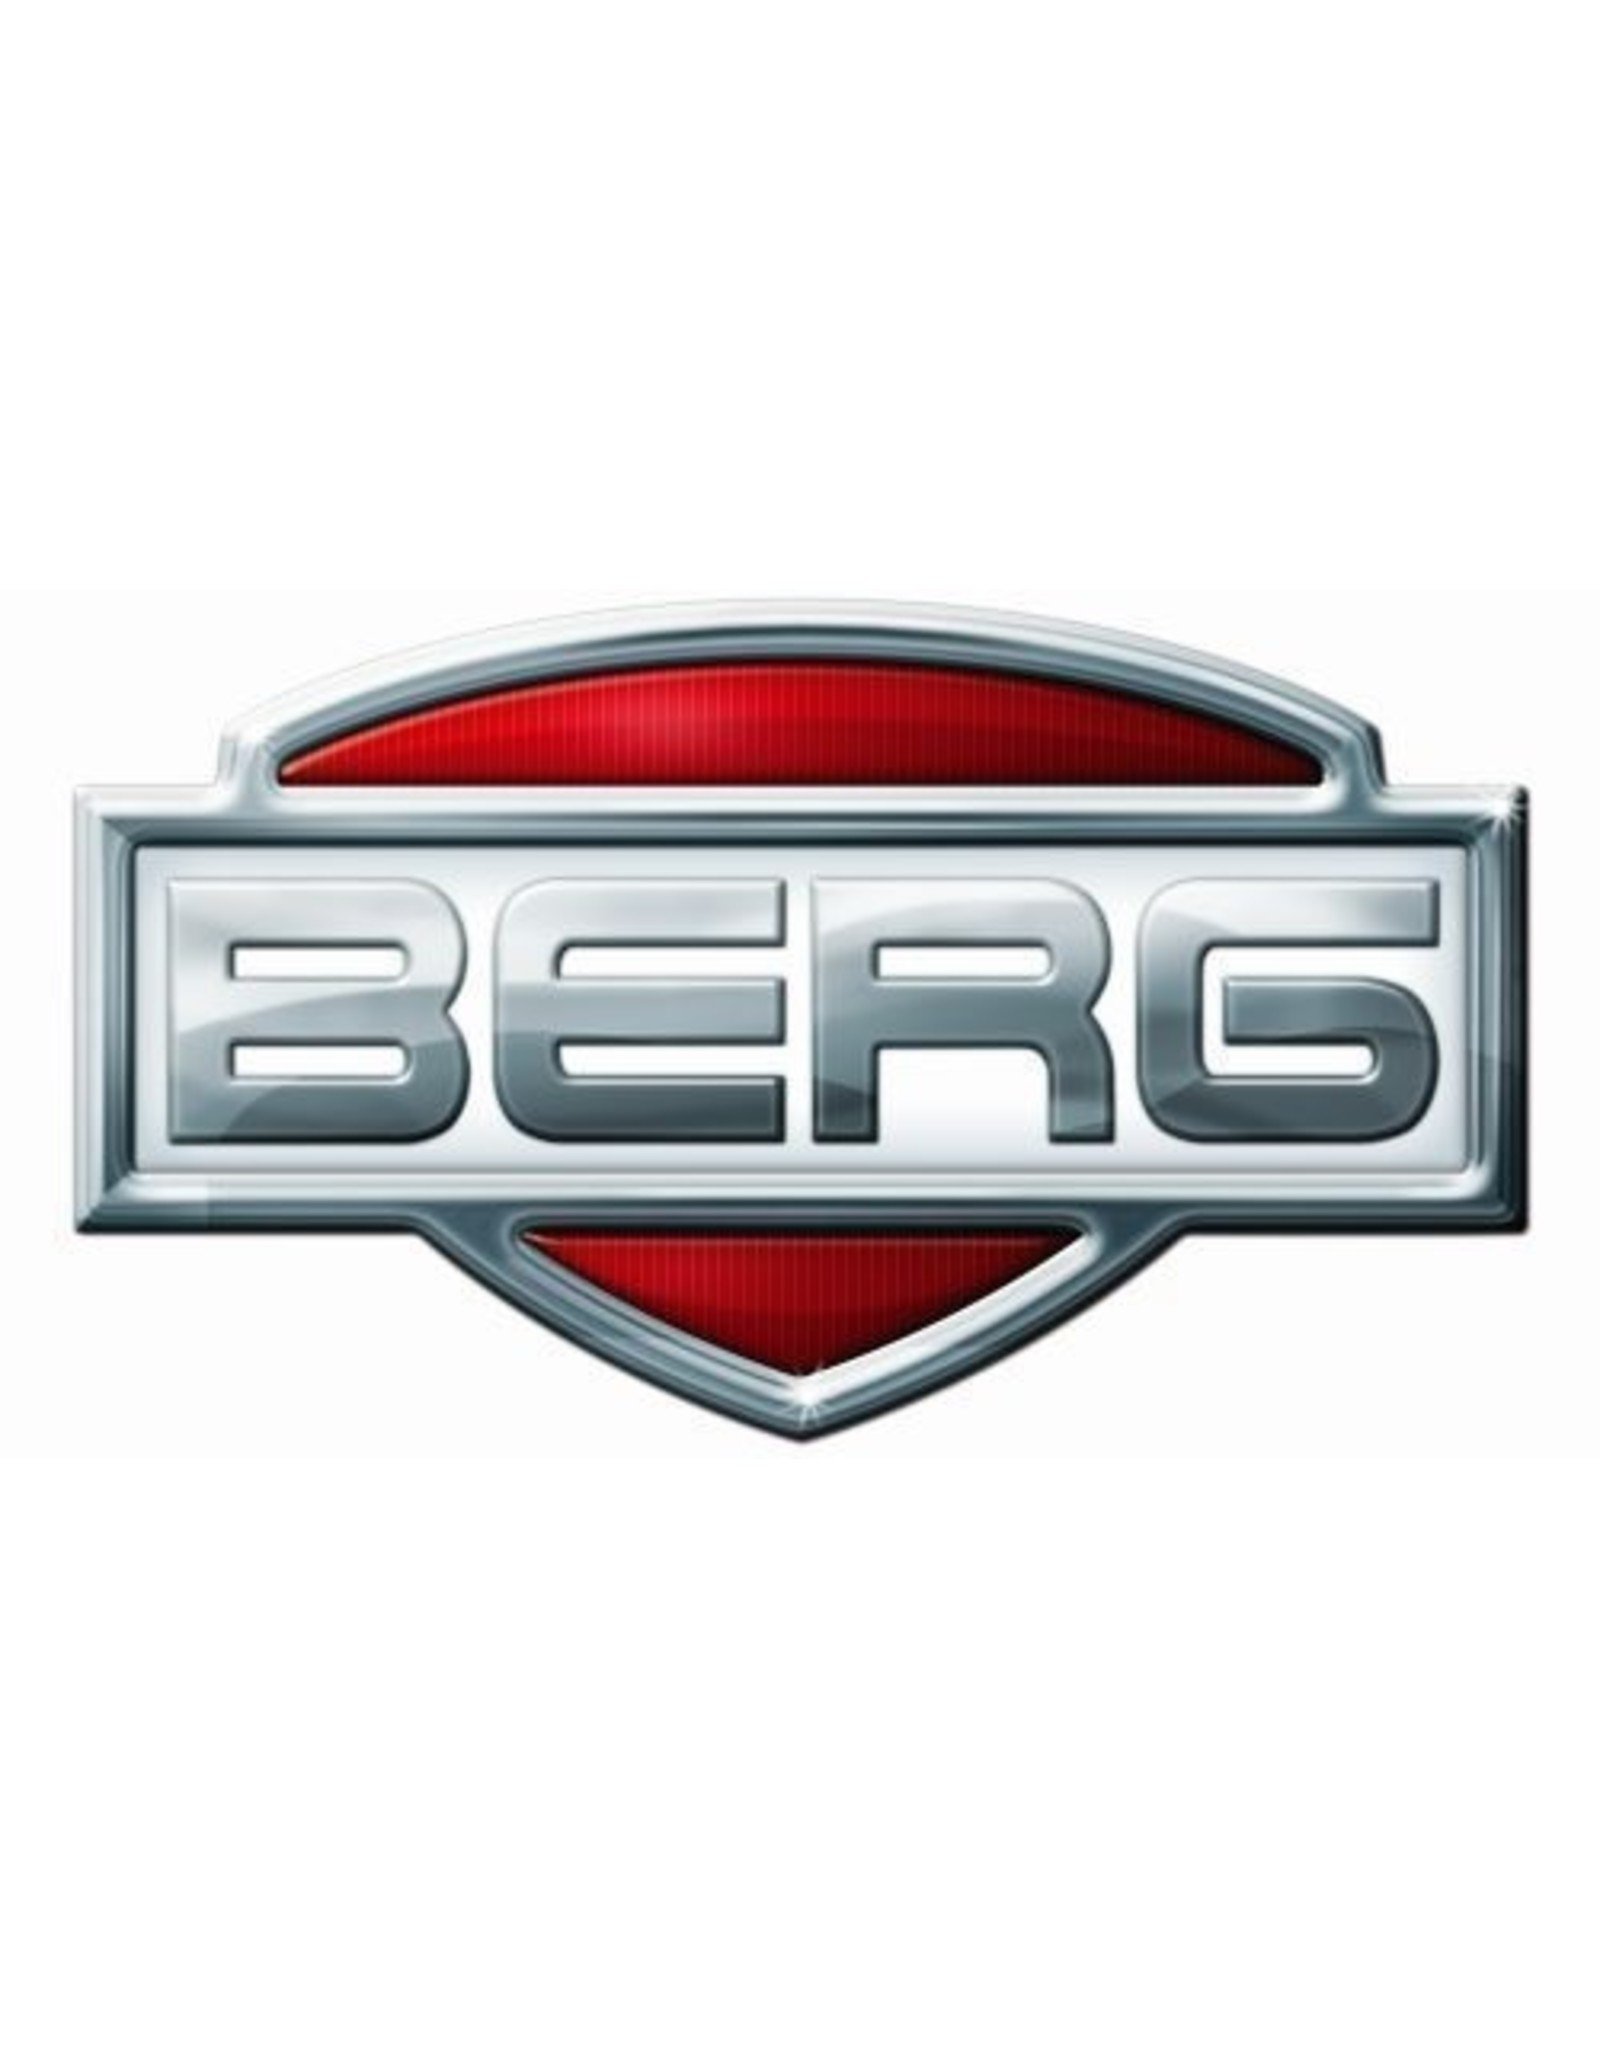 BERG BERG Reifen 12.5X2.25-8 Slick